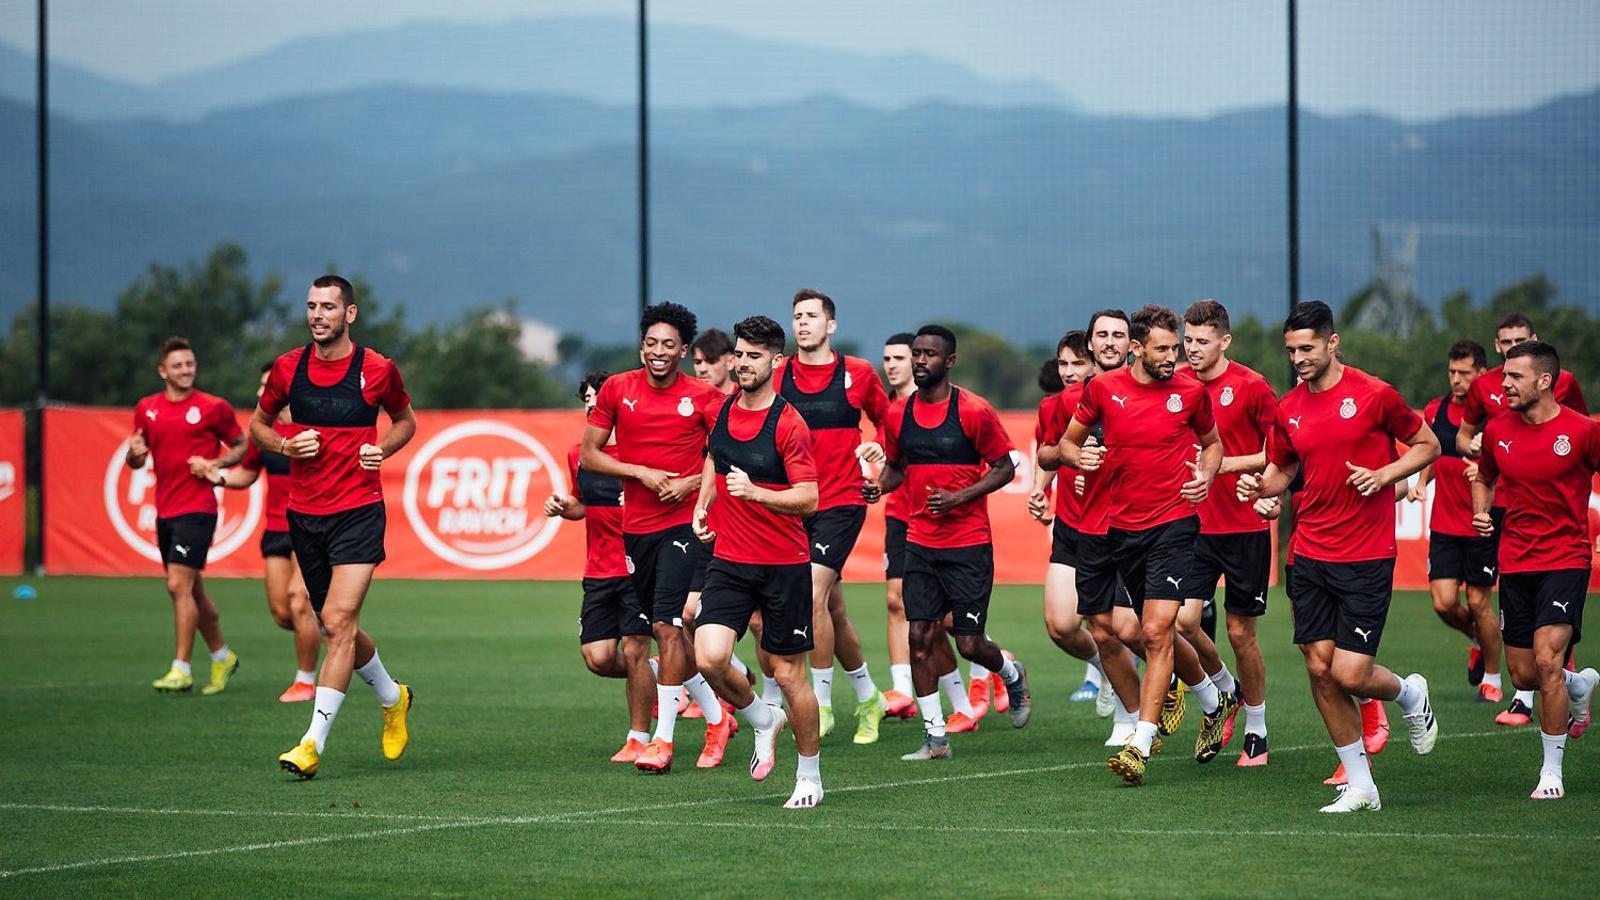 Futbol sense xarxa de seguretat